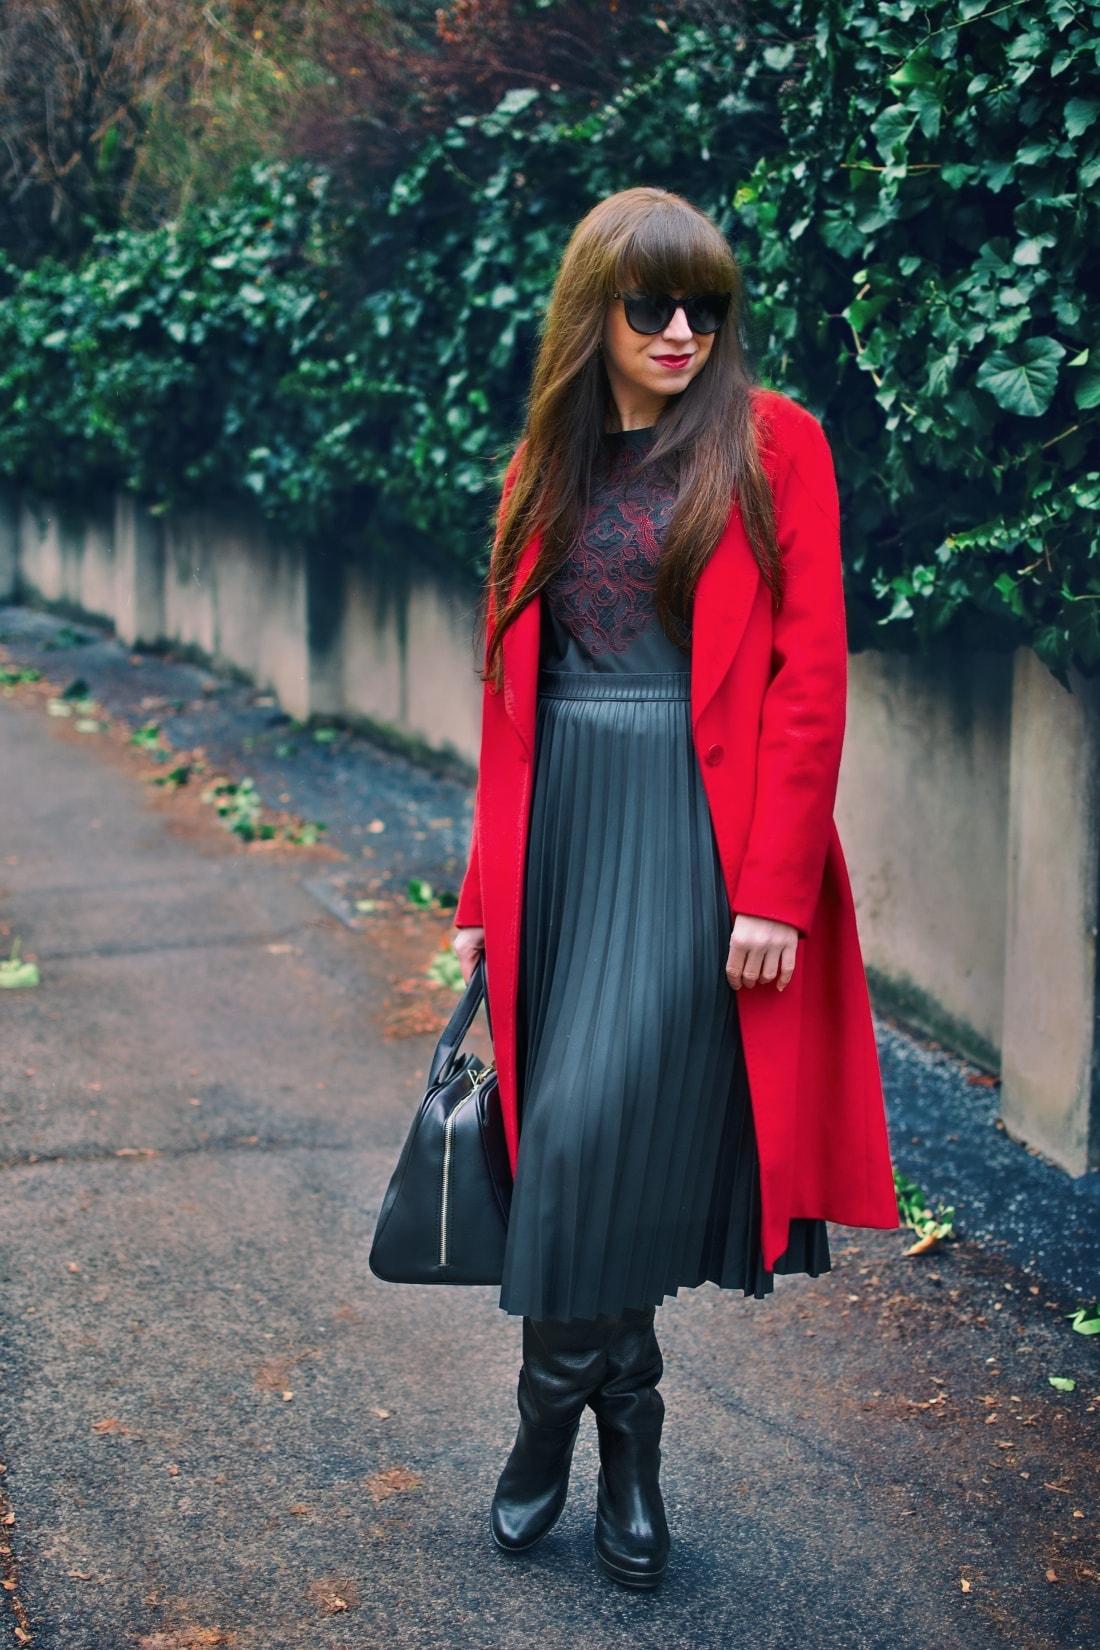 Čierne plisované šaty_Katharine-fashion is beautiful_blog 4_Červený kabát Zara_Kabelka Parfois_Katarína Jakubčová_Fashion blogger